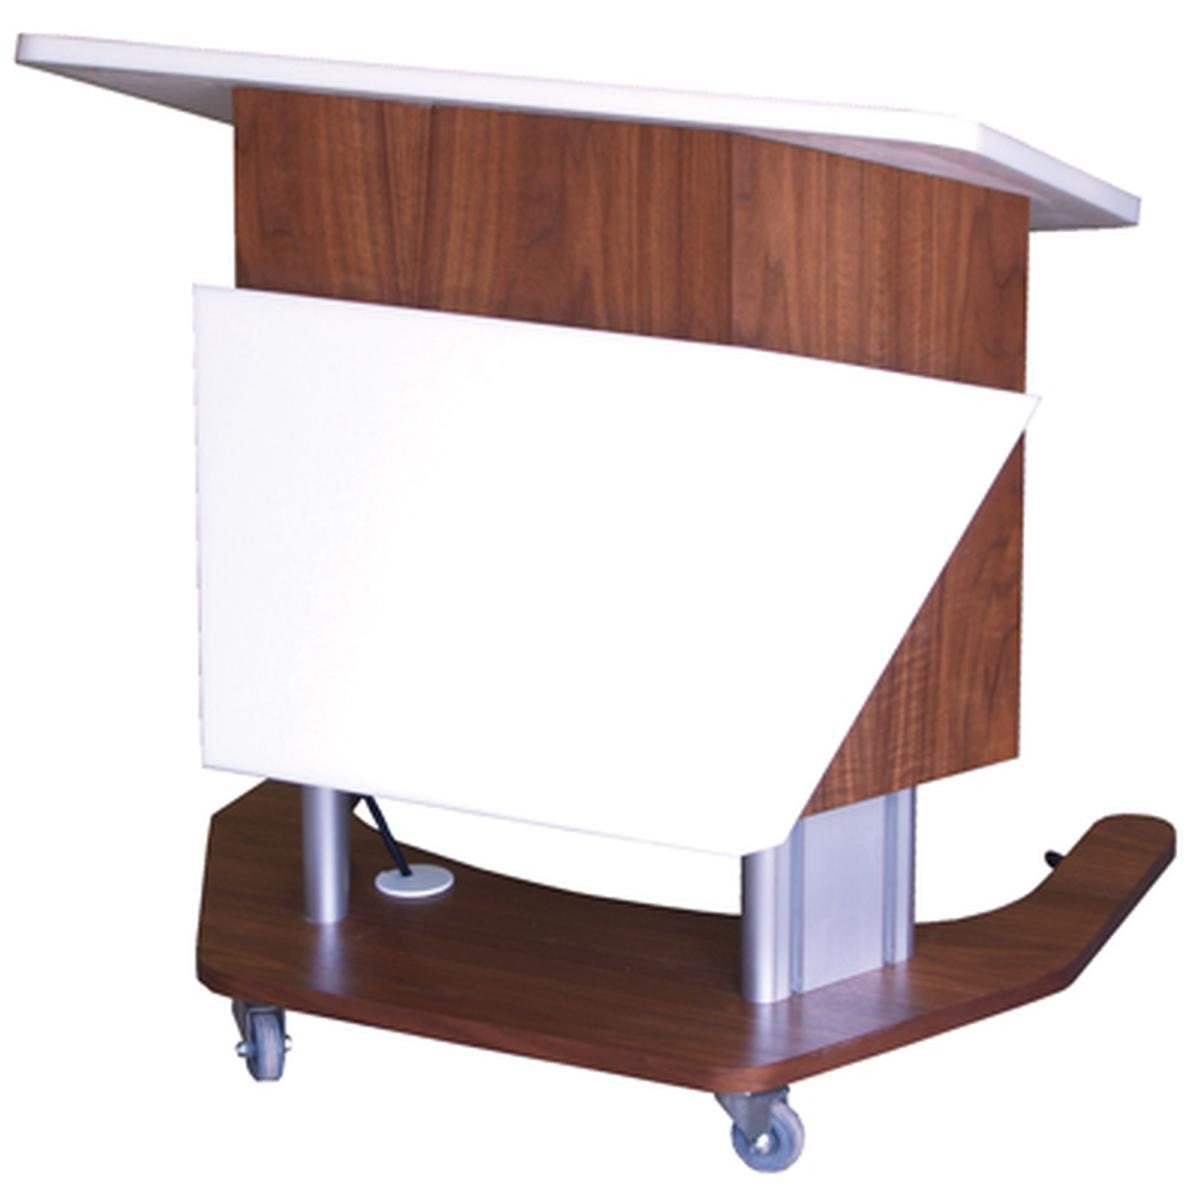 Mlhex 37 30349 Marshall Furniture Hexagon Style